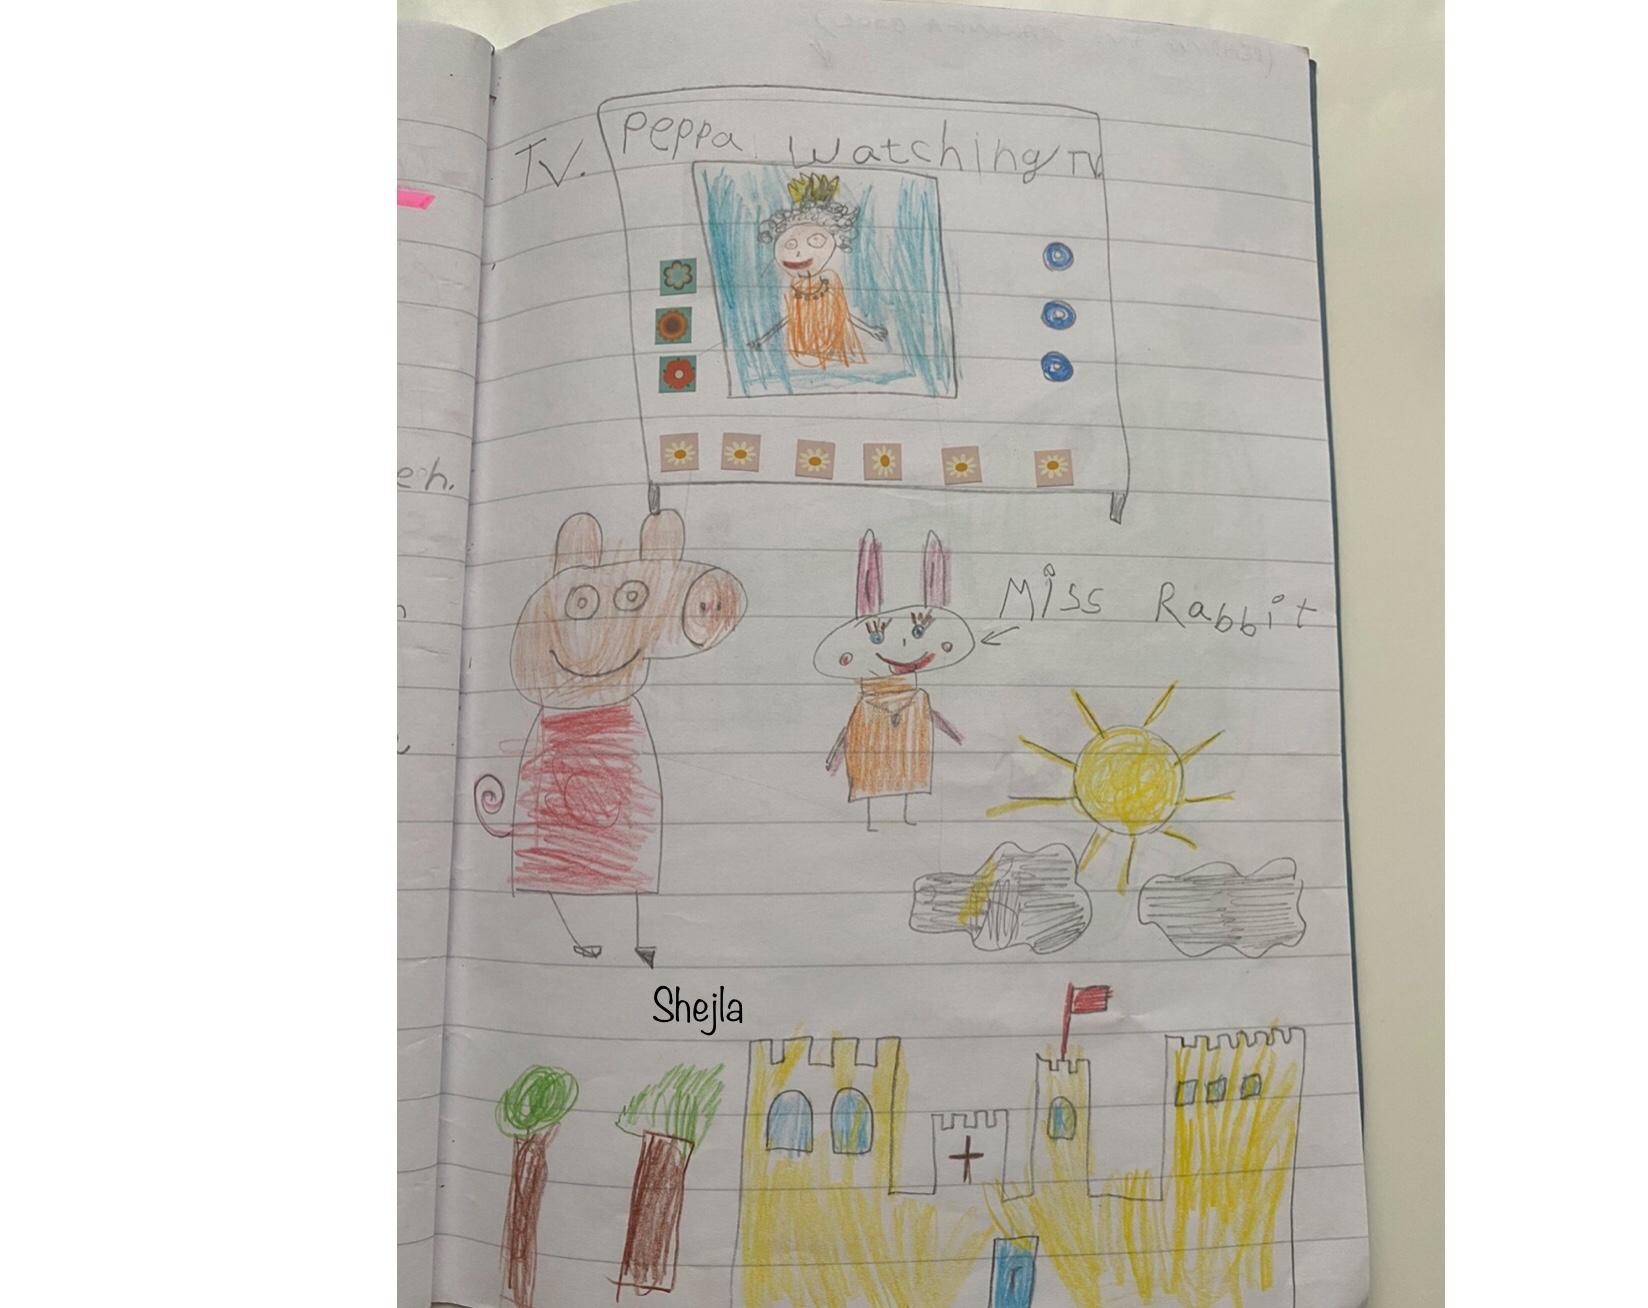 Shejla's wonderful book review!